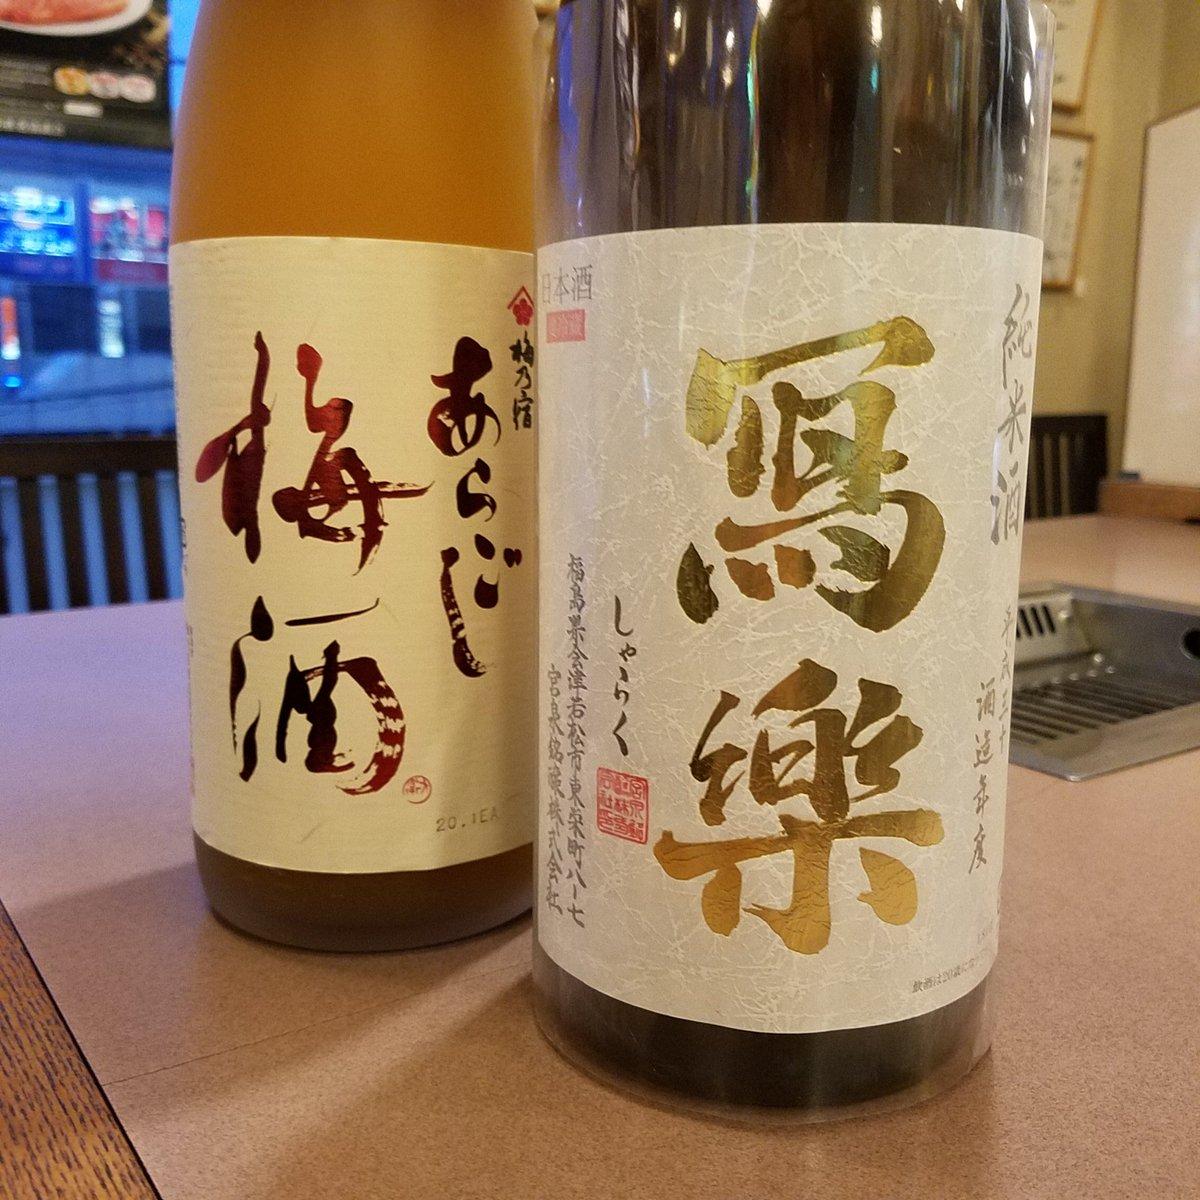 test ツイッターメディア - 本日にしました。 日本酒 写楽 純米酒 梅酒 あらごし梅酒 https://t.co/LSYQhGM2IY